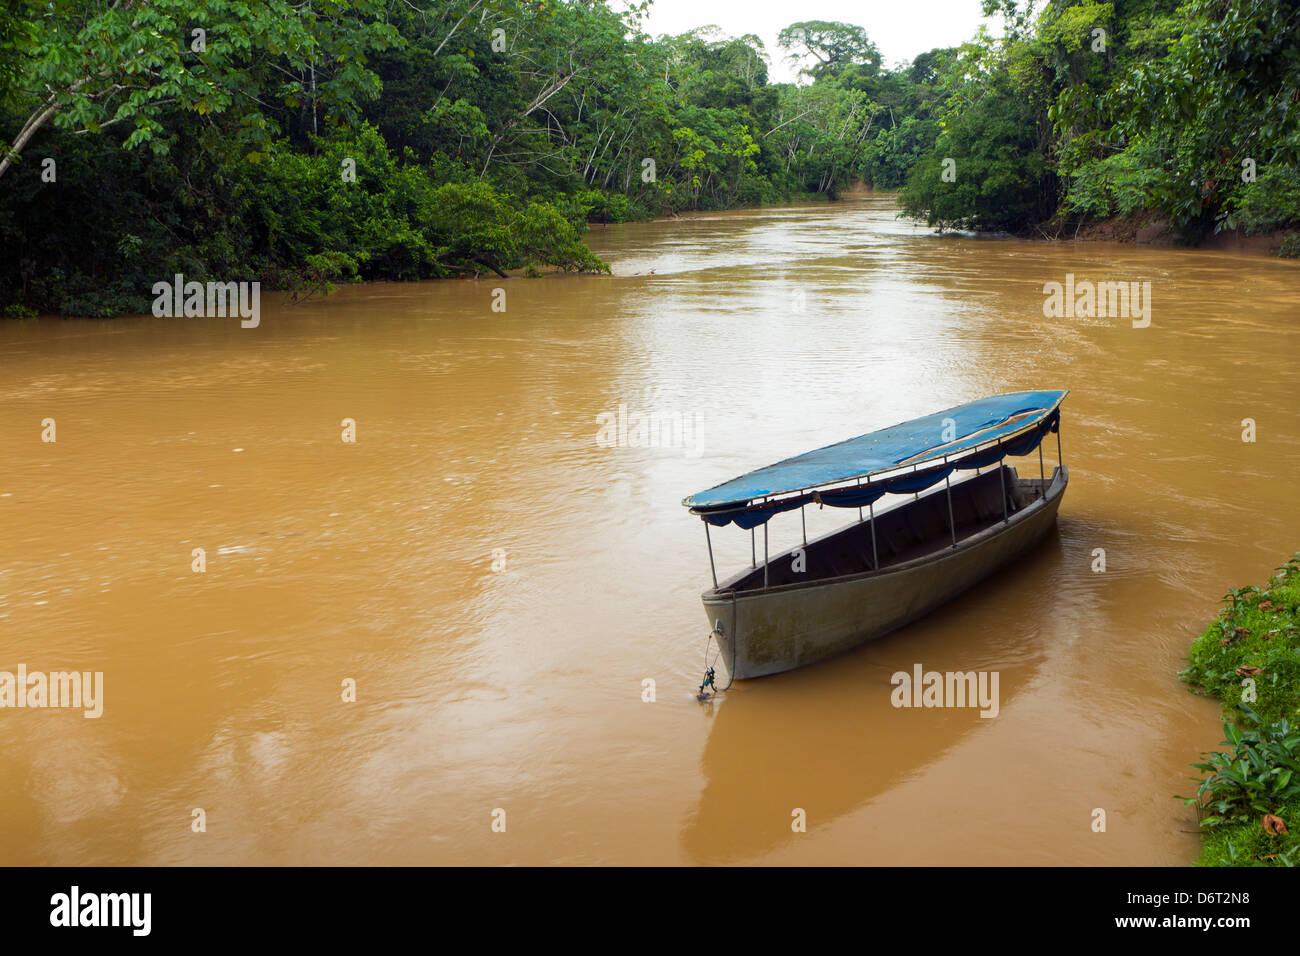 Canoe moored beside the Rio Tiputini in the Ecuadorian Amazon - Stock Image